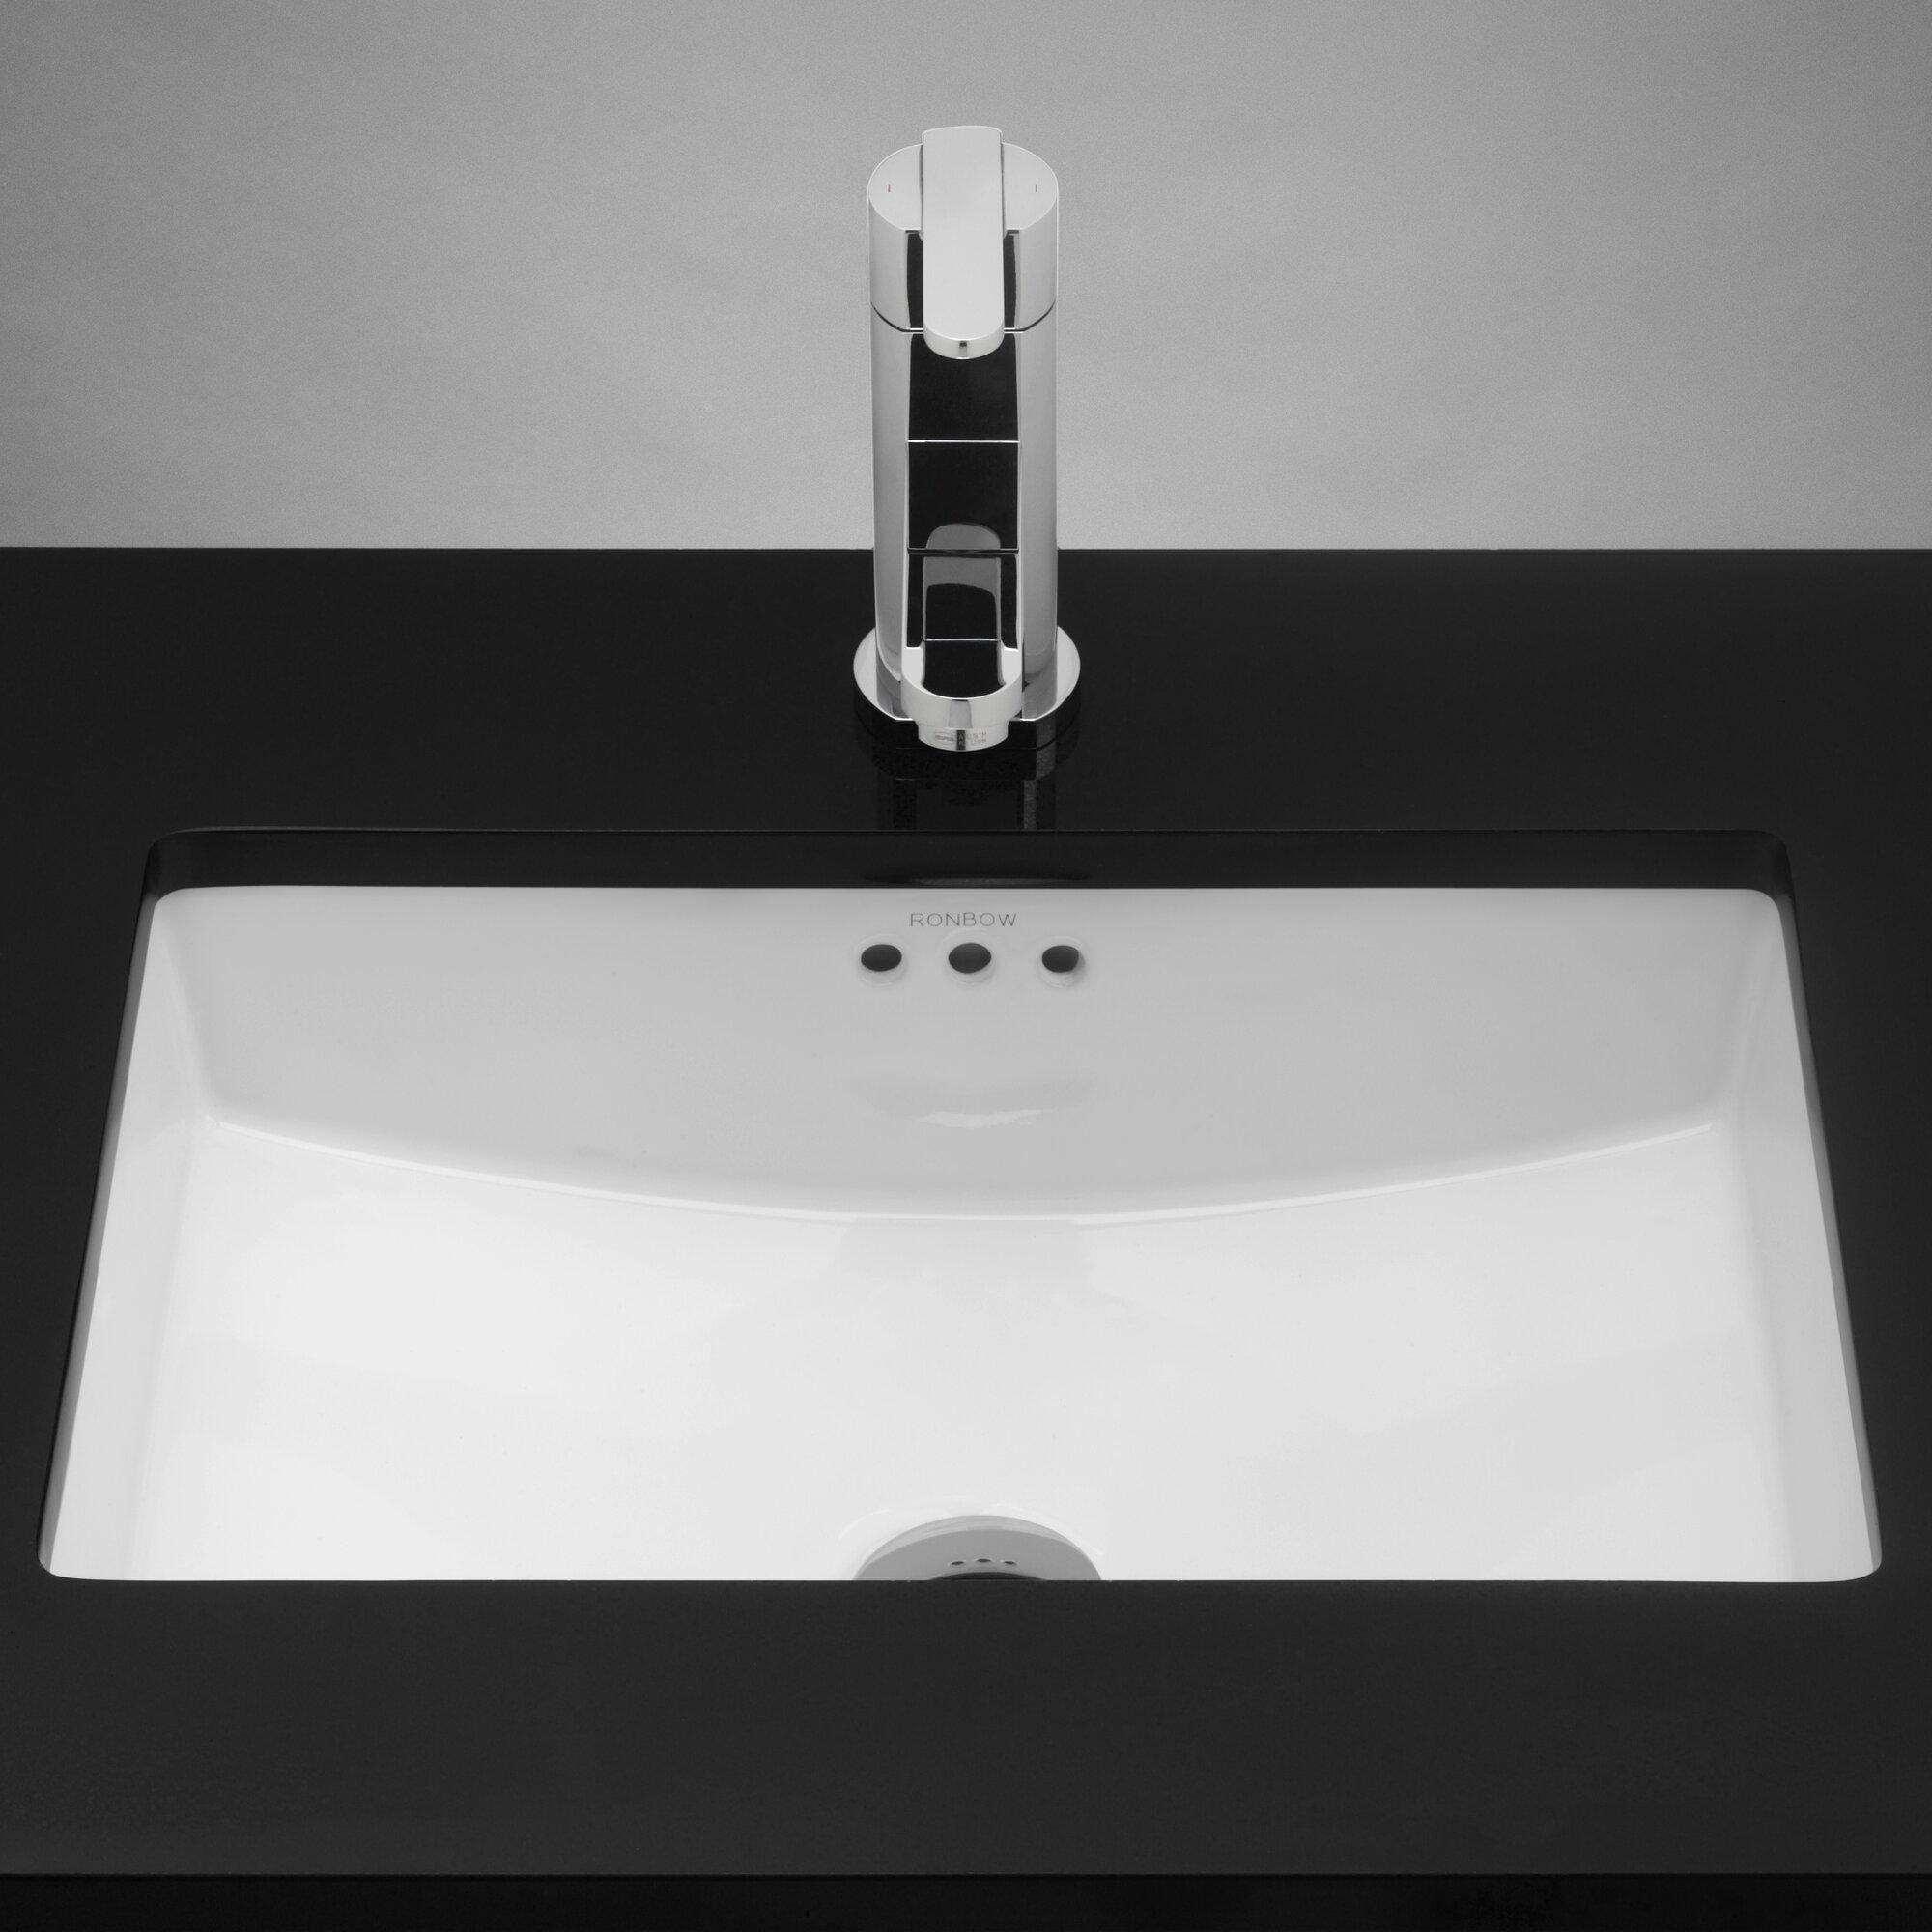 Modern bathroom sinks - Lesteter Ceramic Rectangular Undermount Bathroom Sink With Overflow